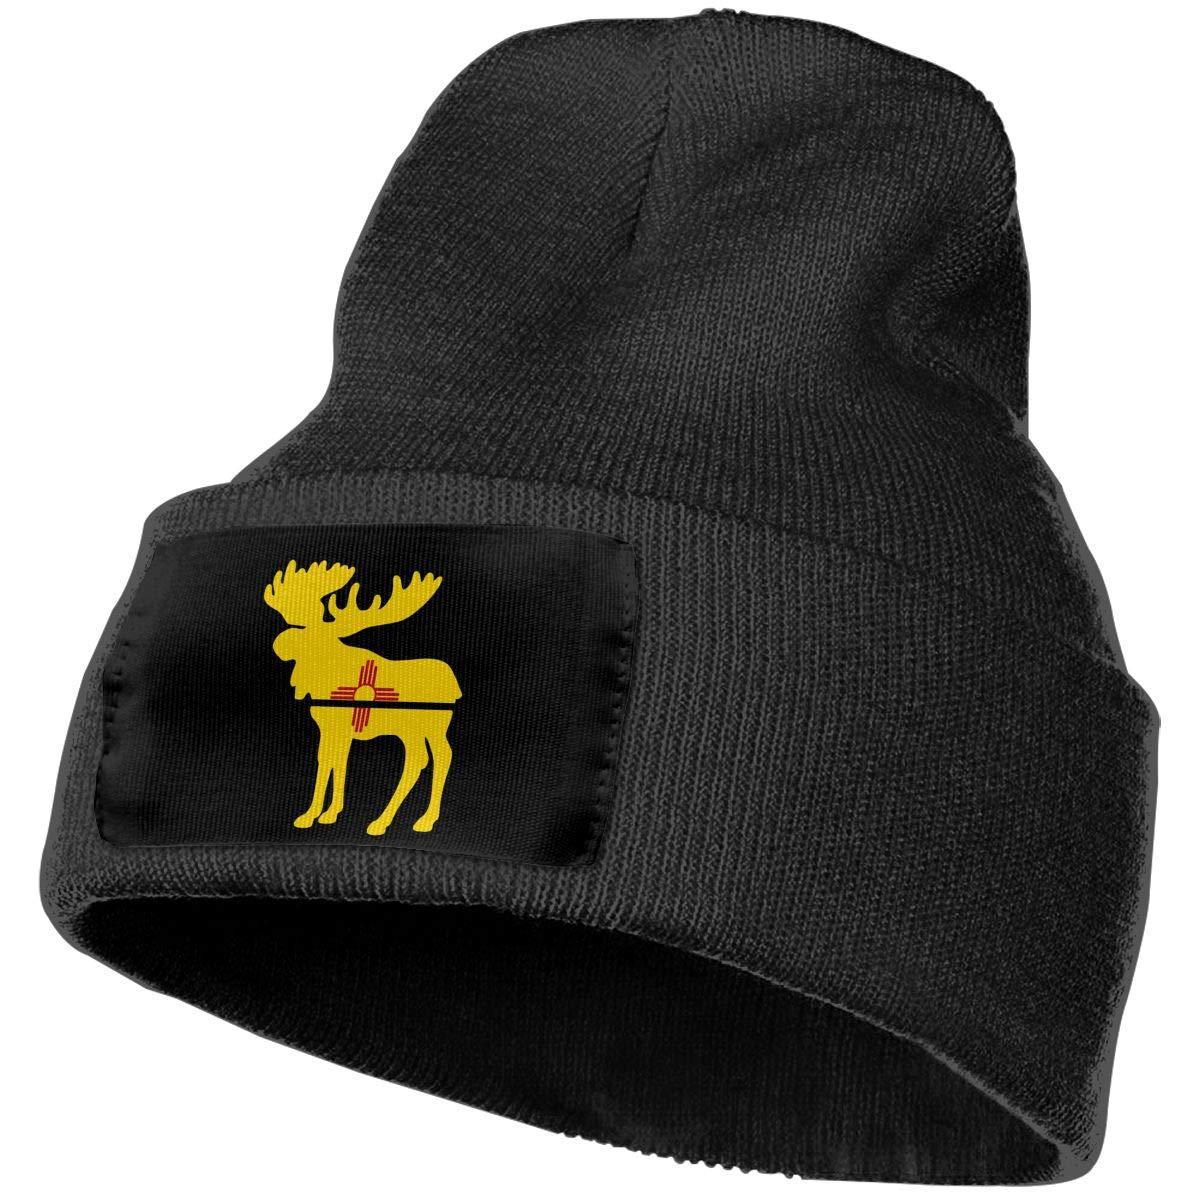 MXMAOM9MX Moose Mexico Flag Warm Knitting Hat Mens Womens 100/% Acrylic Skull Cap